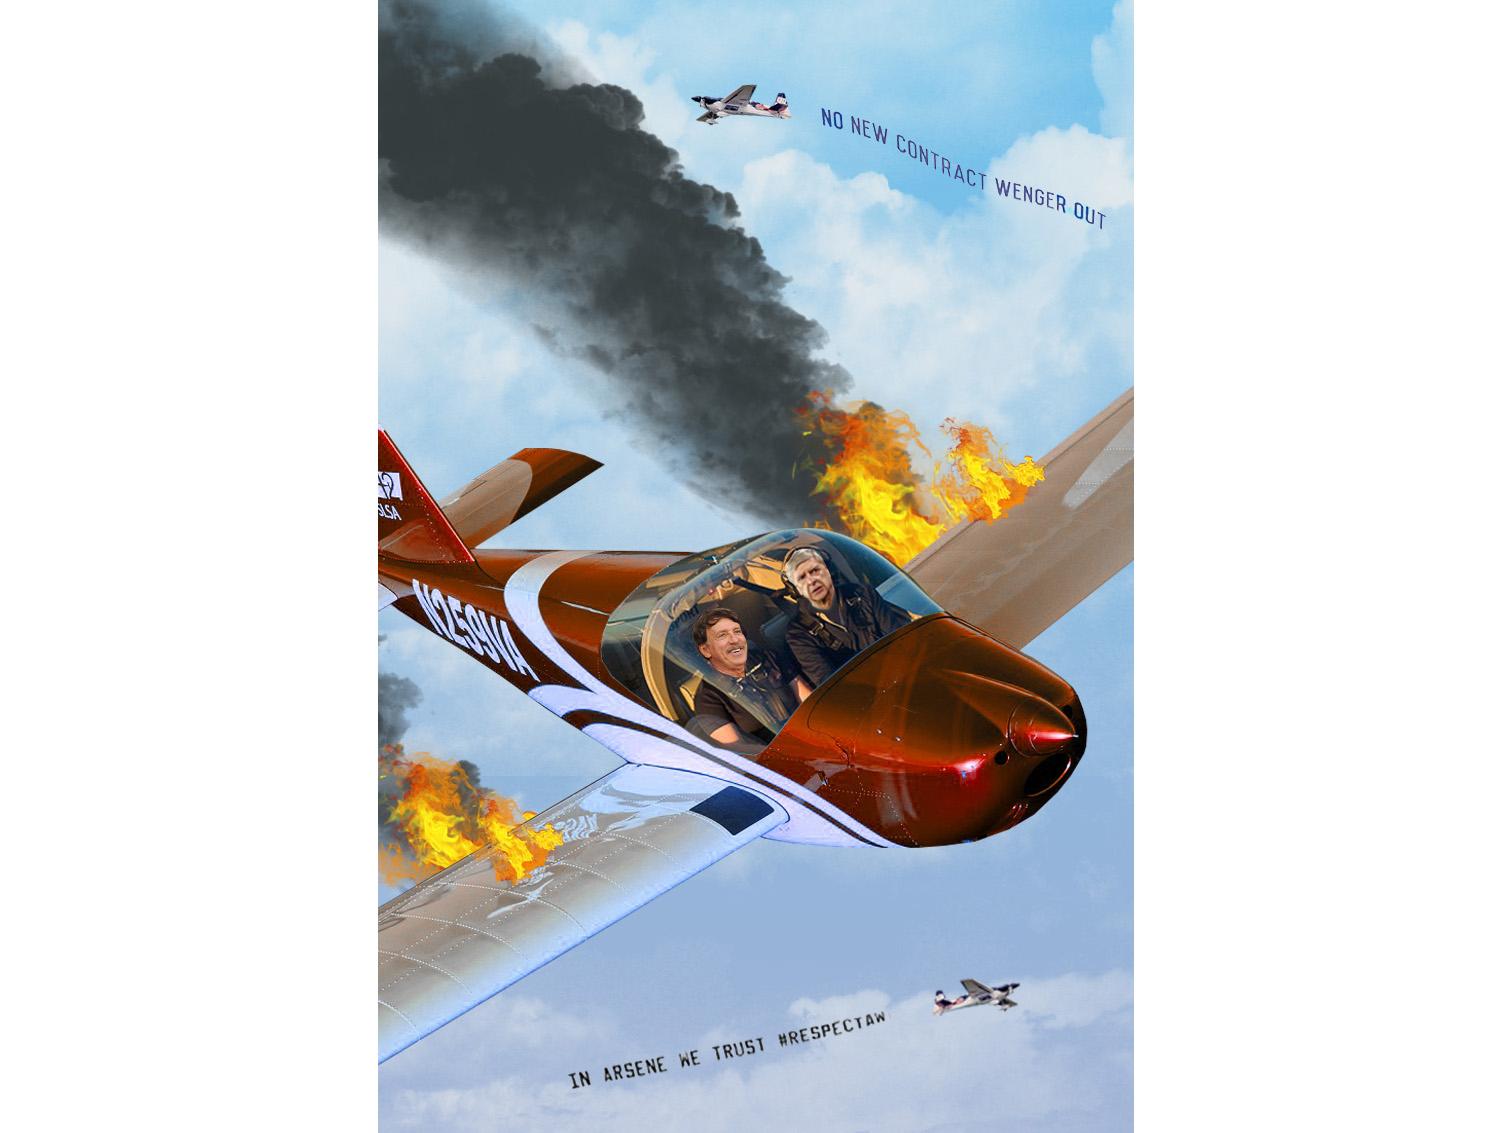 Published: Magazine Arsenal Illustration stan kroenke arsene wenger plane turmoil graphic design photoshop football sport arsenal magzine design